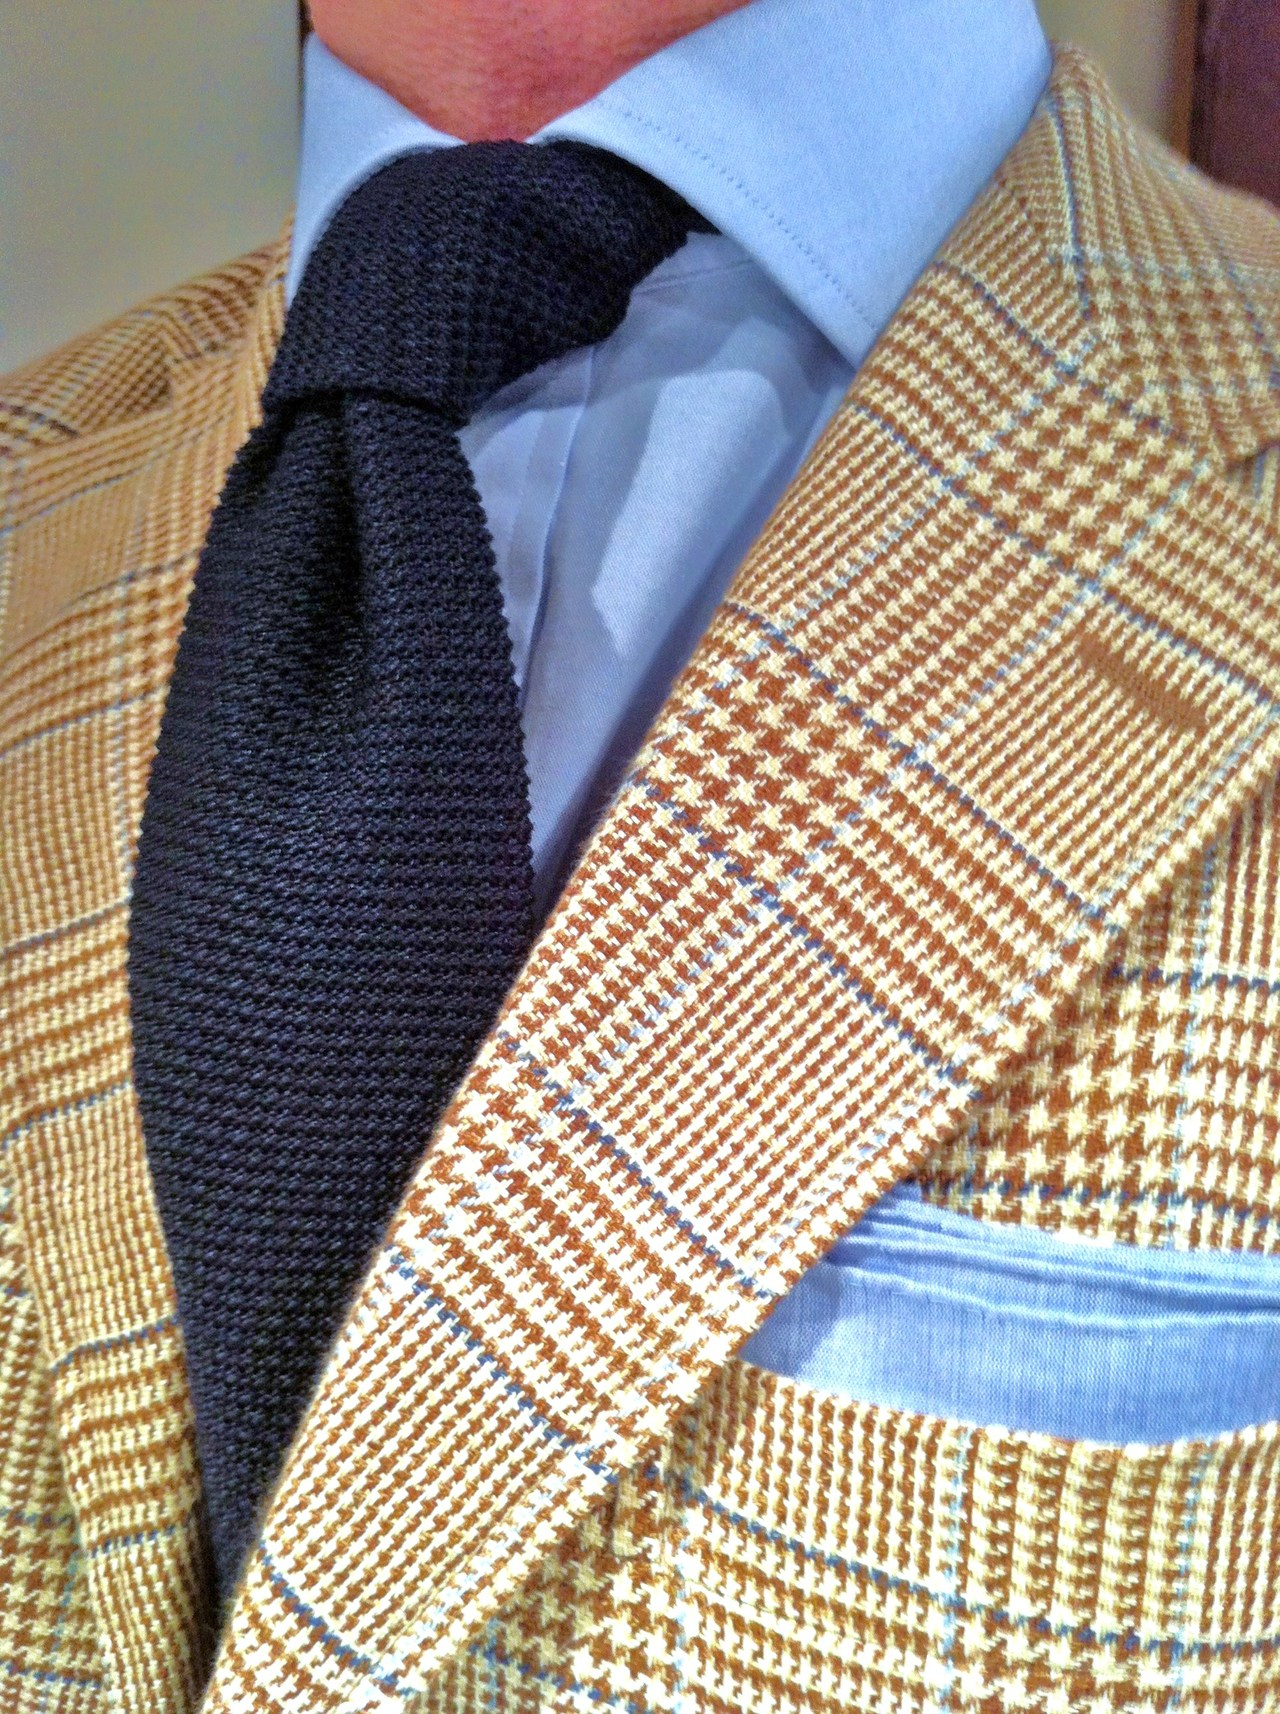 Amazing Ocher Blue Glen Plaid Sport Coat Knitted Tie Collar Shirt Unbelievable Soletopia